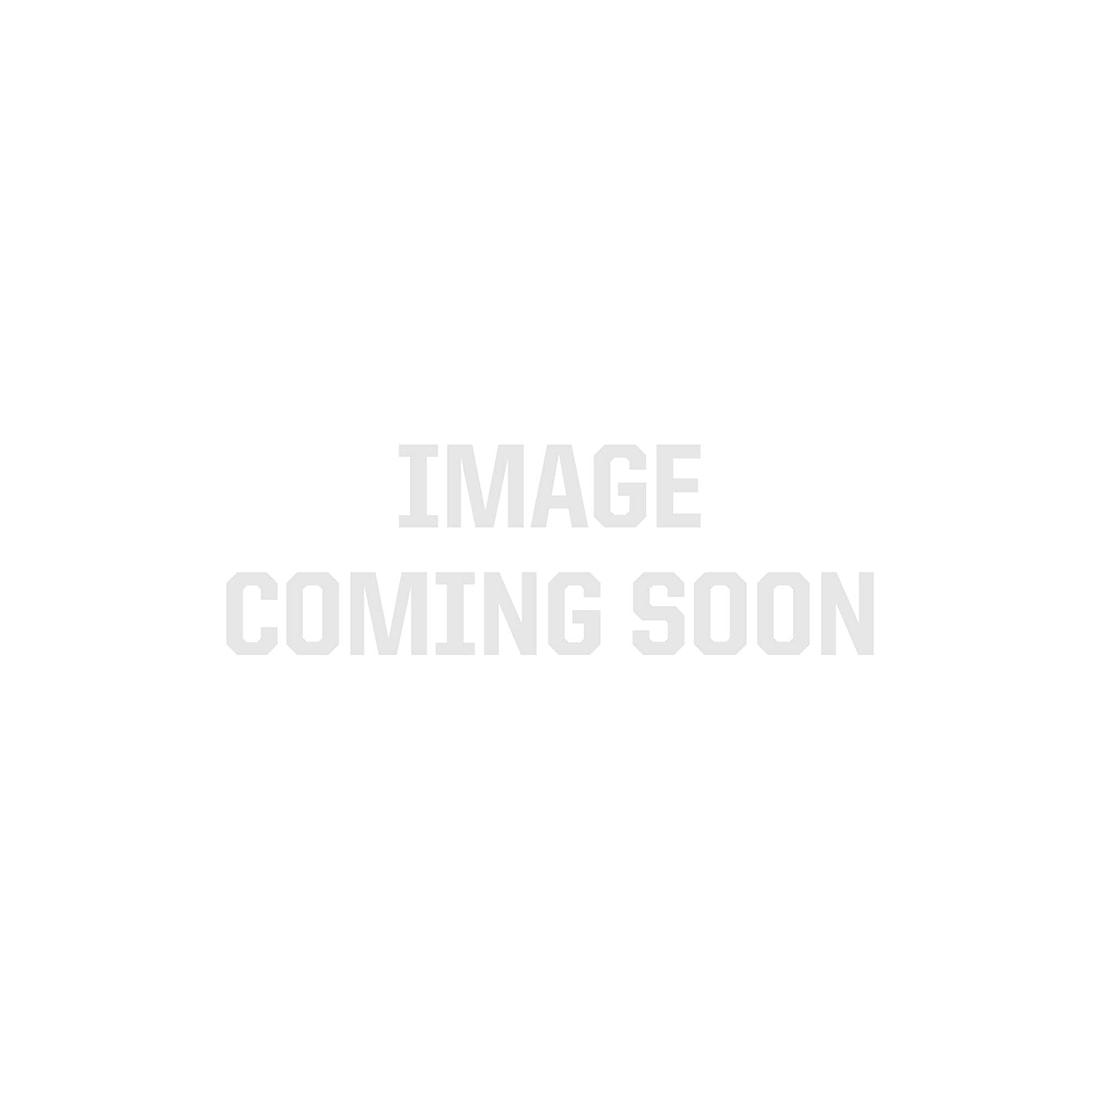 Universal Dimming Driver - 24 VDC - 2x96W